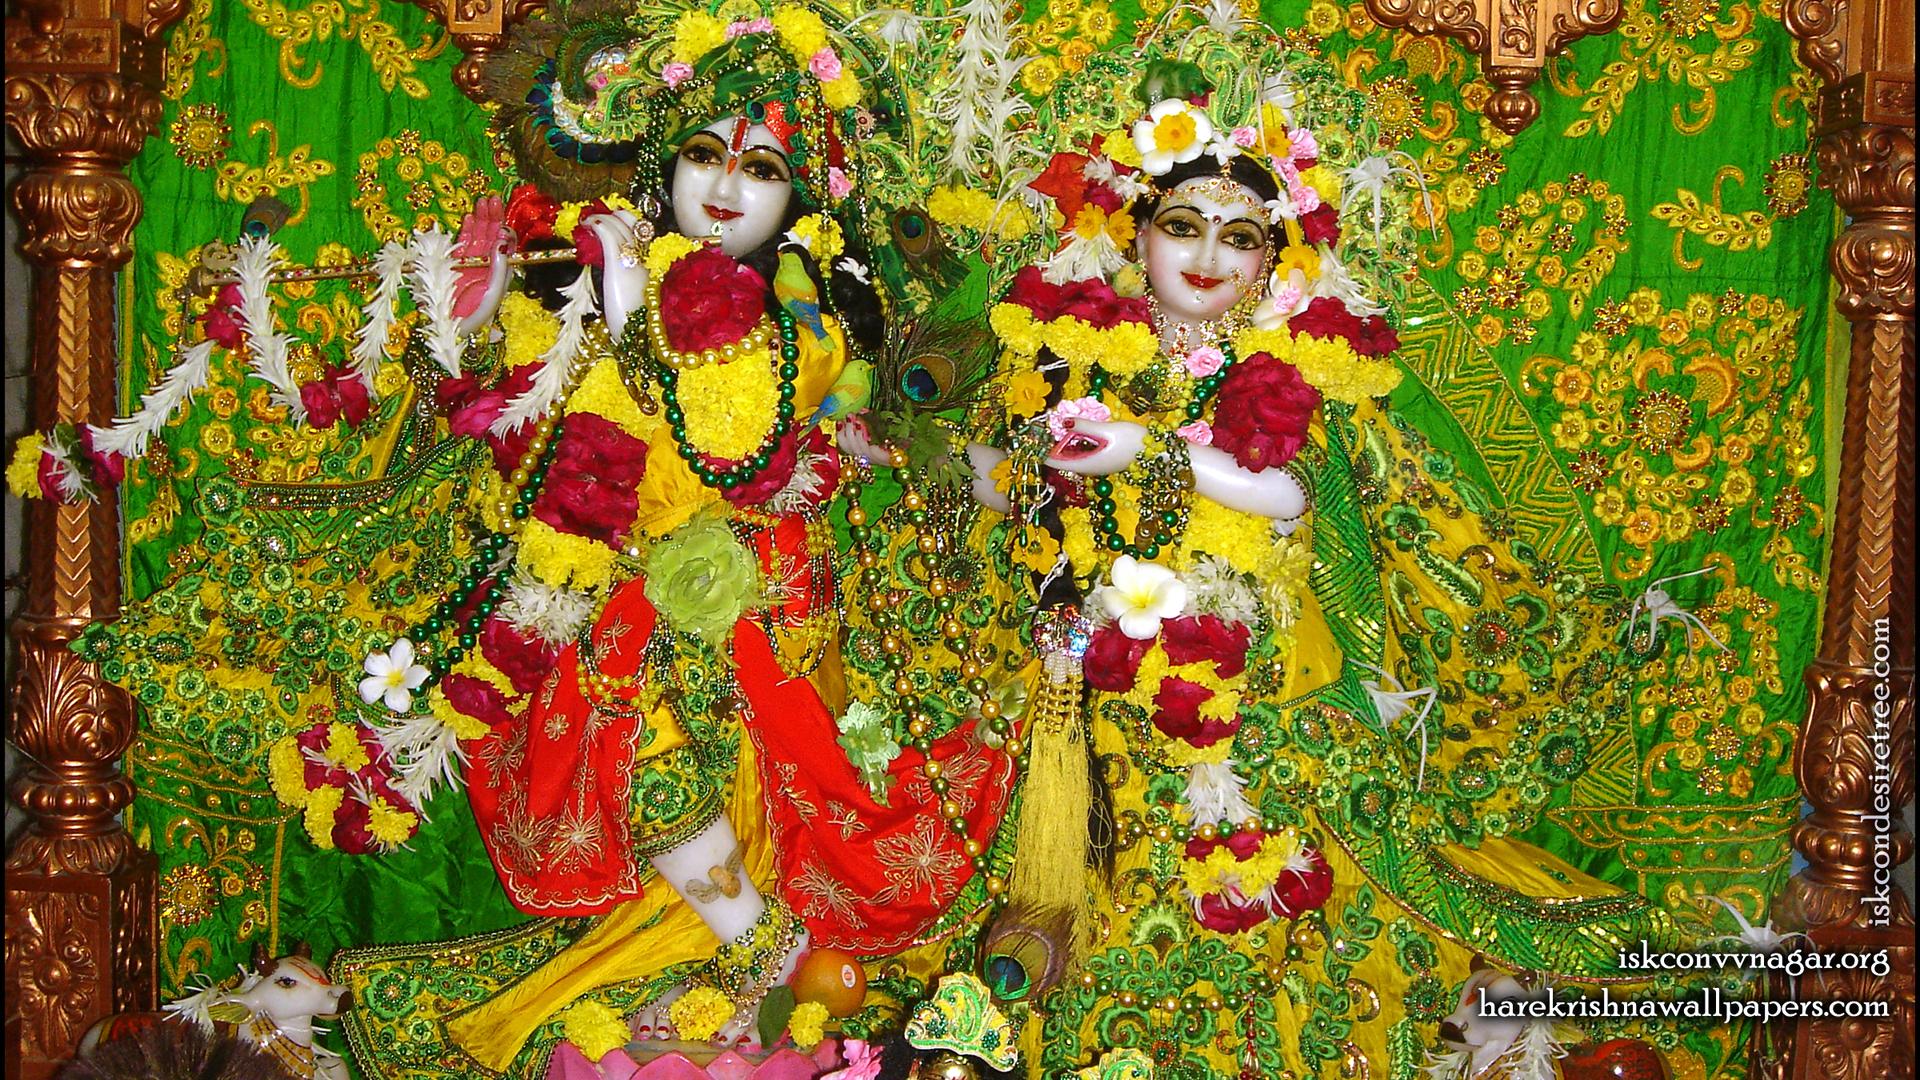 Sri Sri Radha Giridhari Wallpaper (011) Size 1920x1080 Download